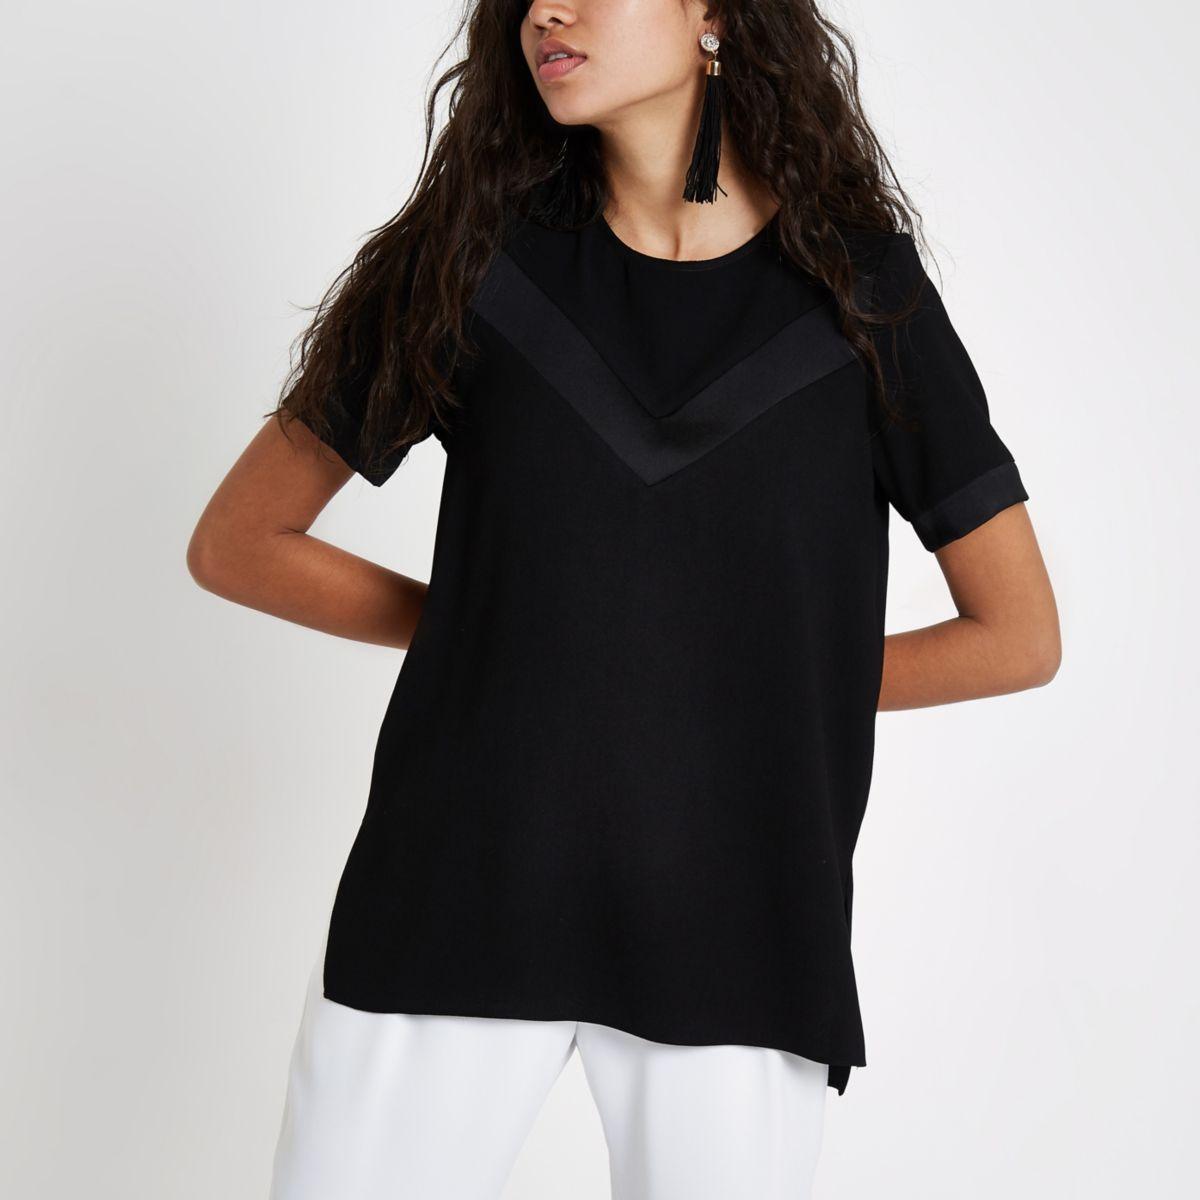 Black loose fit blouse